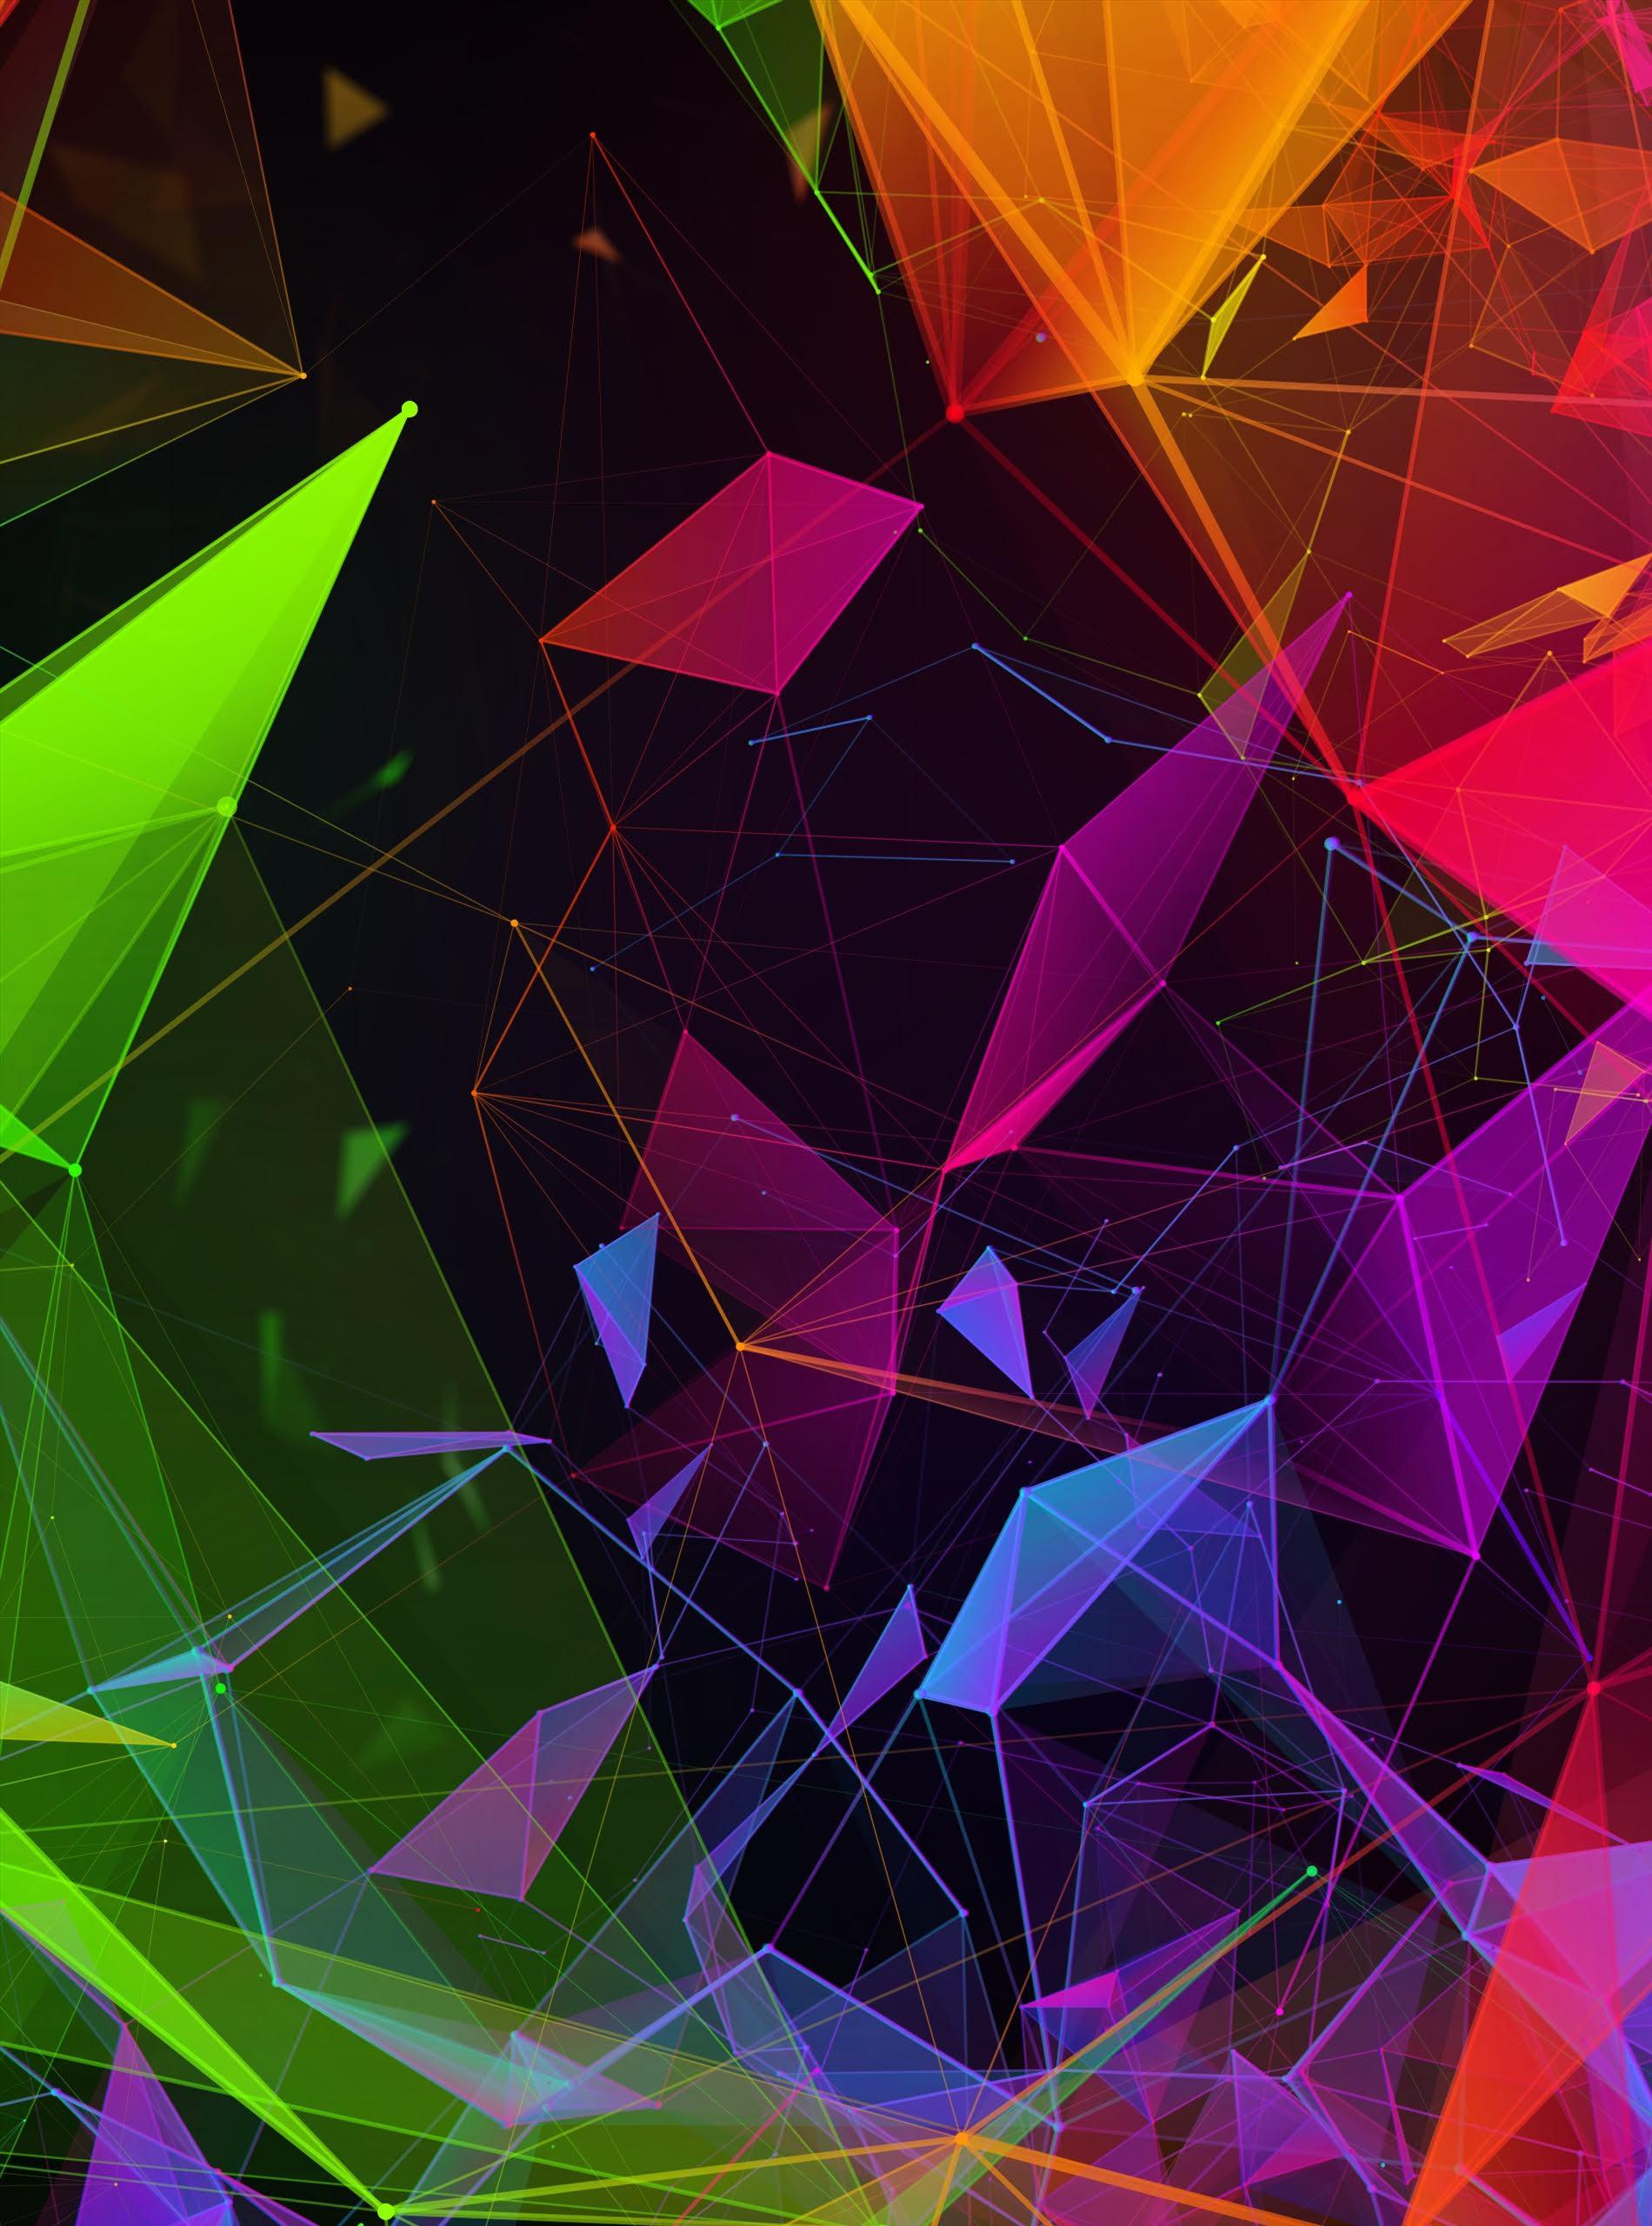 Razer Phone Wallpapers - Top Free Razer